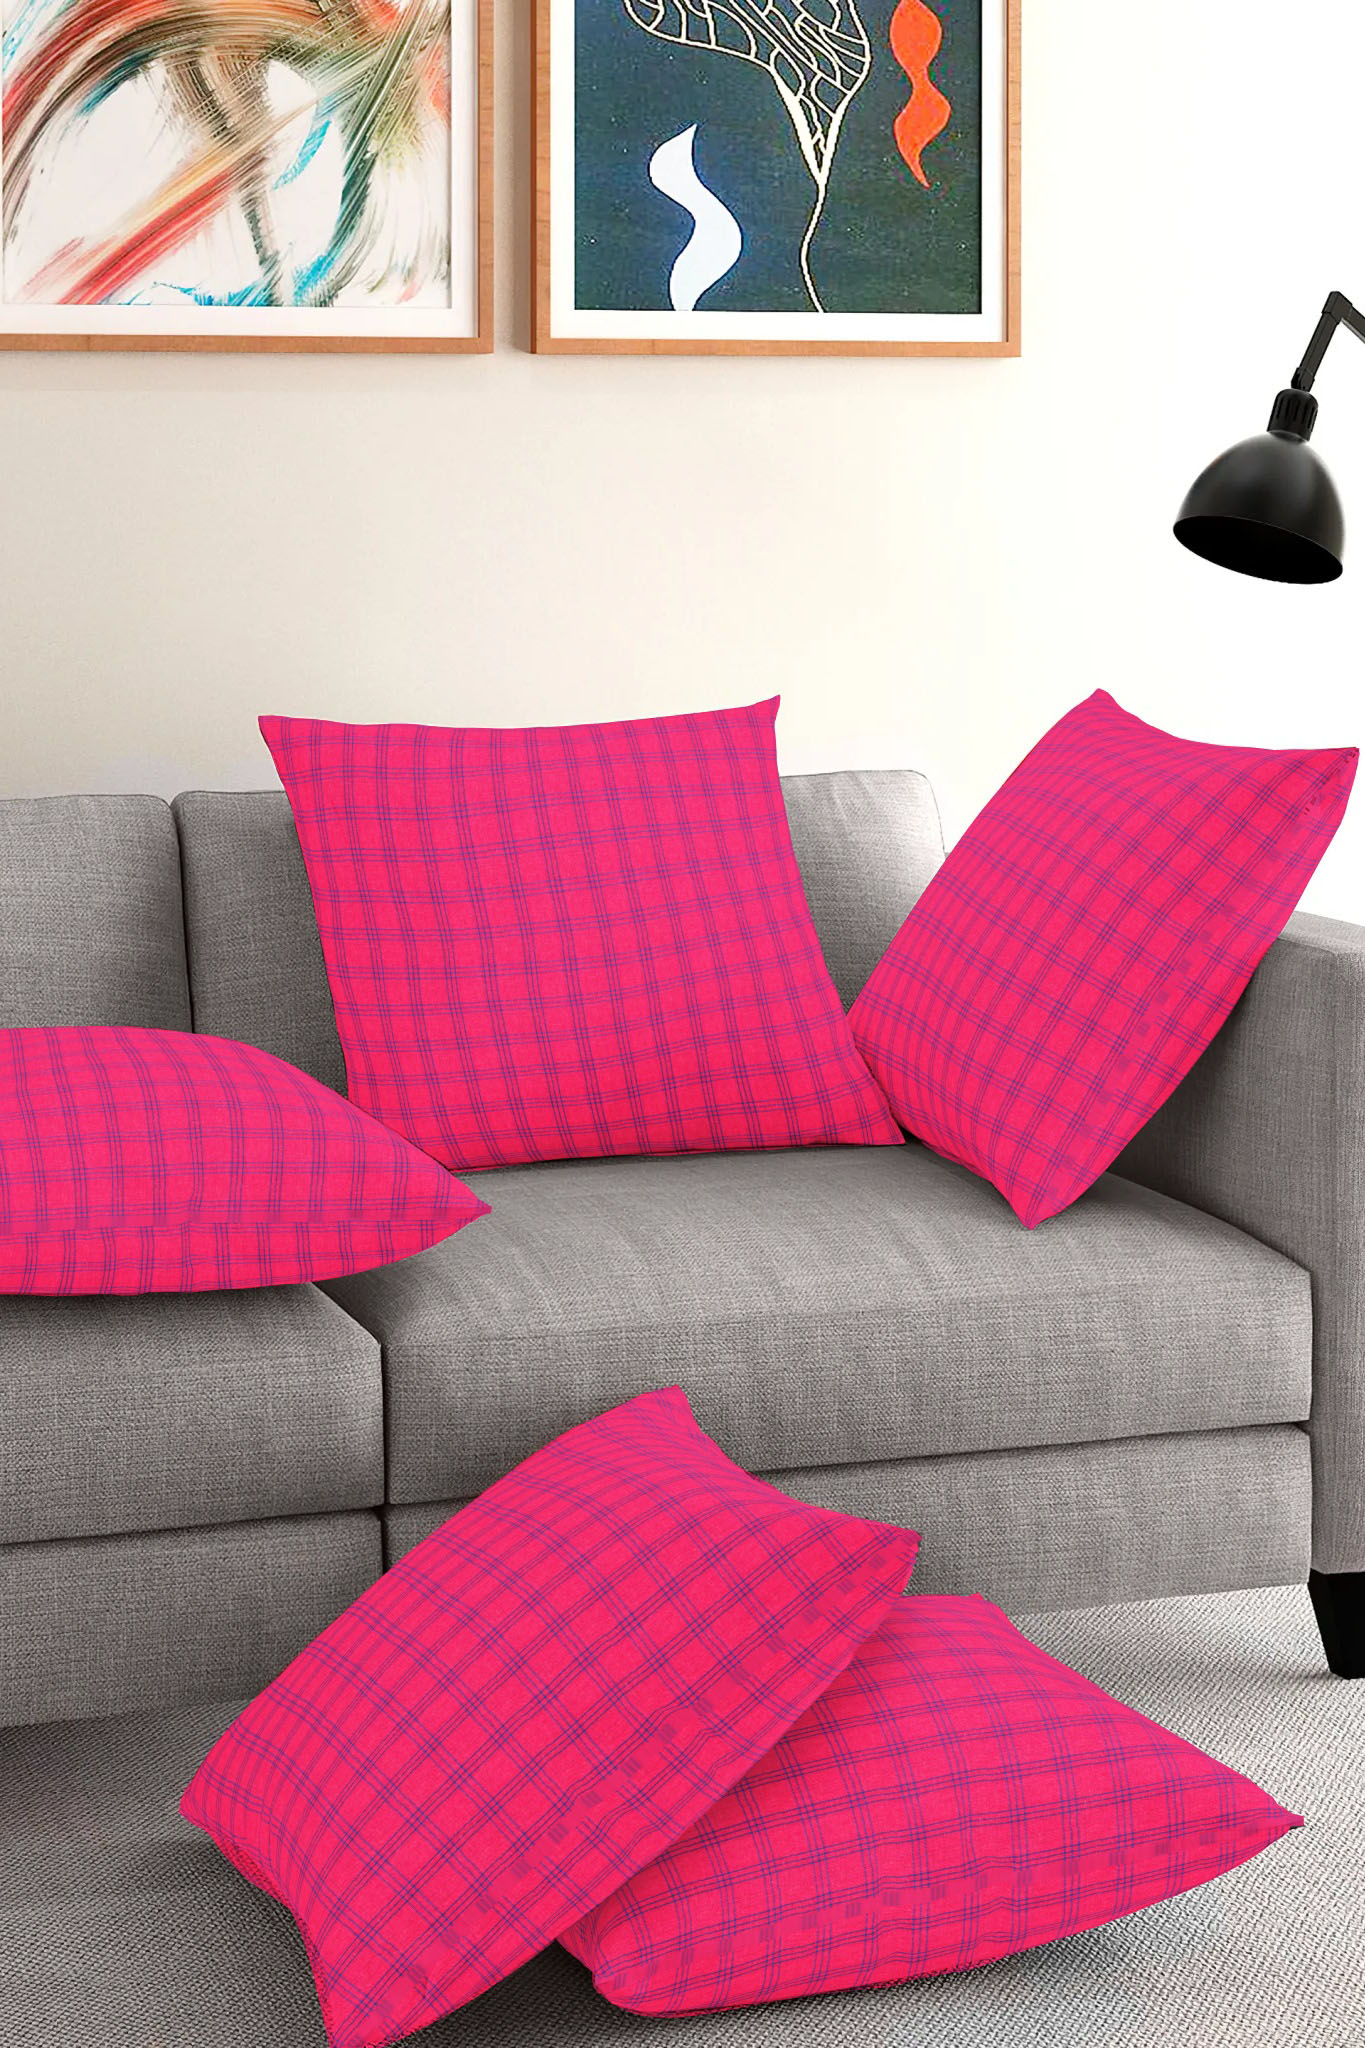 /home/customer/www/fabartcraft.com/public_html/uploadshttps://www.shopolics.com/uploads/images/medium/Magenta-Pink-Blue-Cotton-Cushion-Cover-35384.jpg